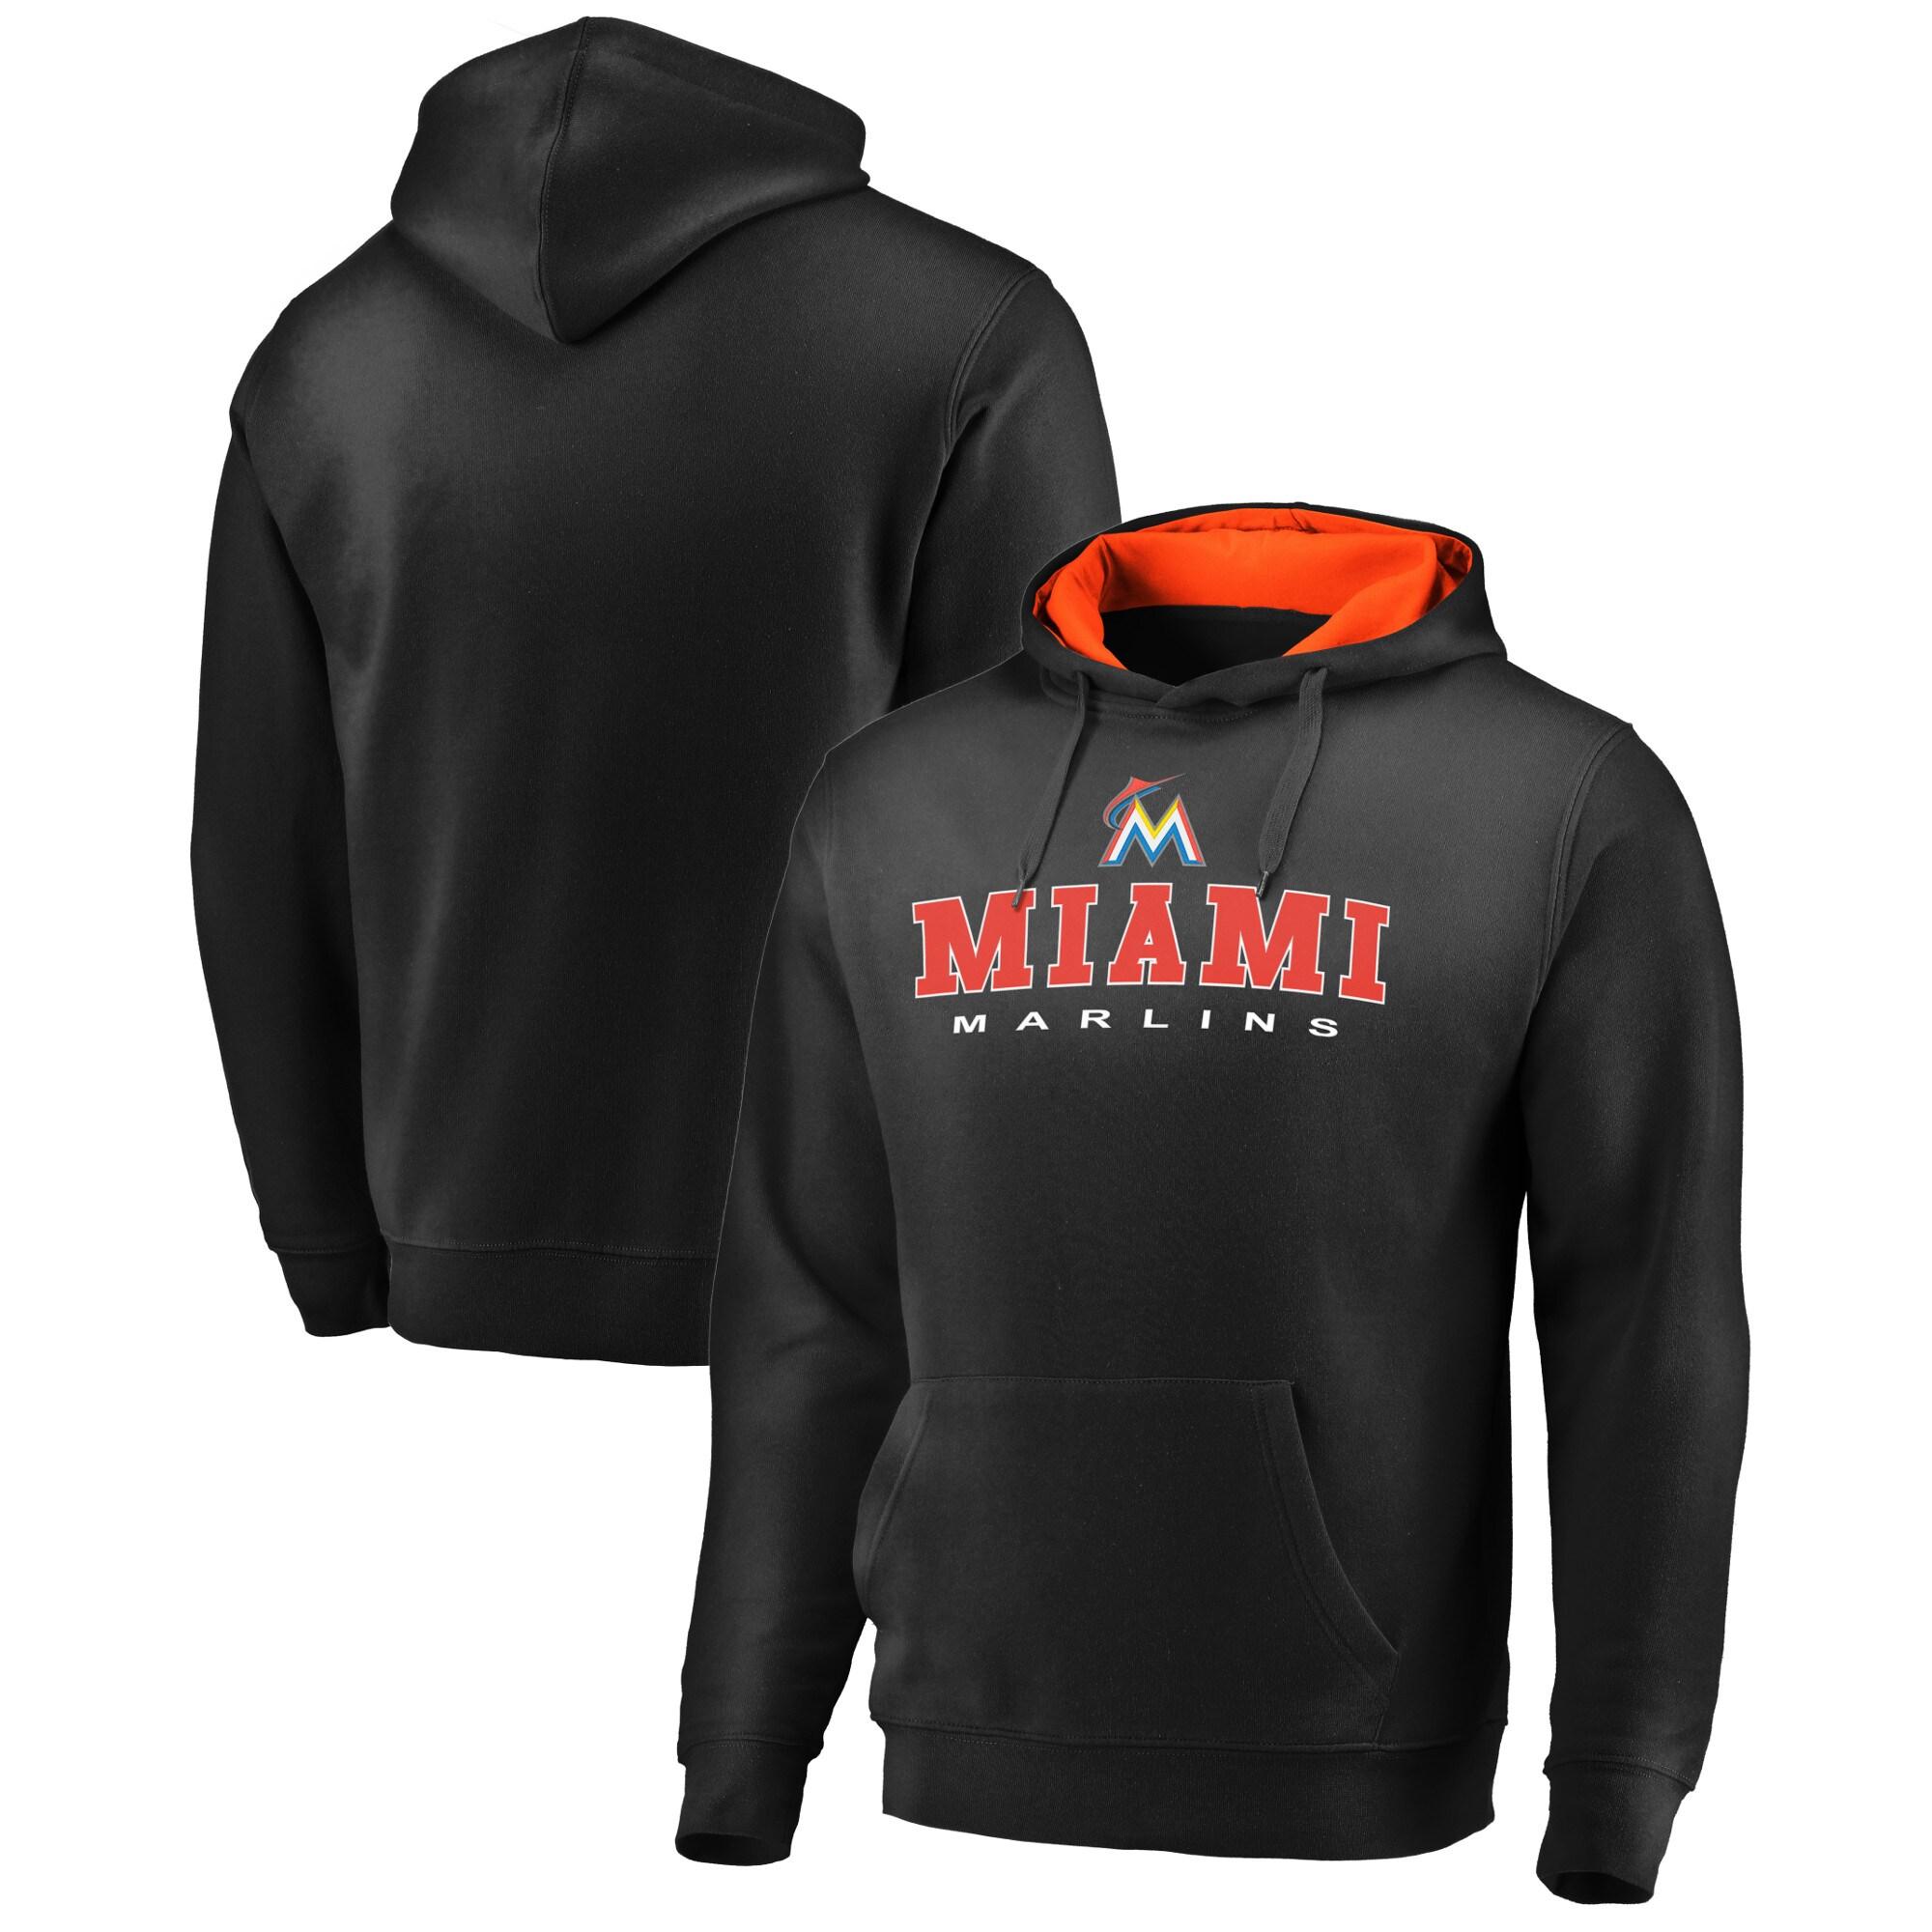 Miami Marlins Fanatics Branded Big & Tall Block Lineup Zone Fleece Pullover Hoodie - Black